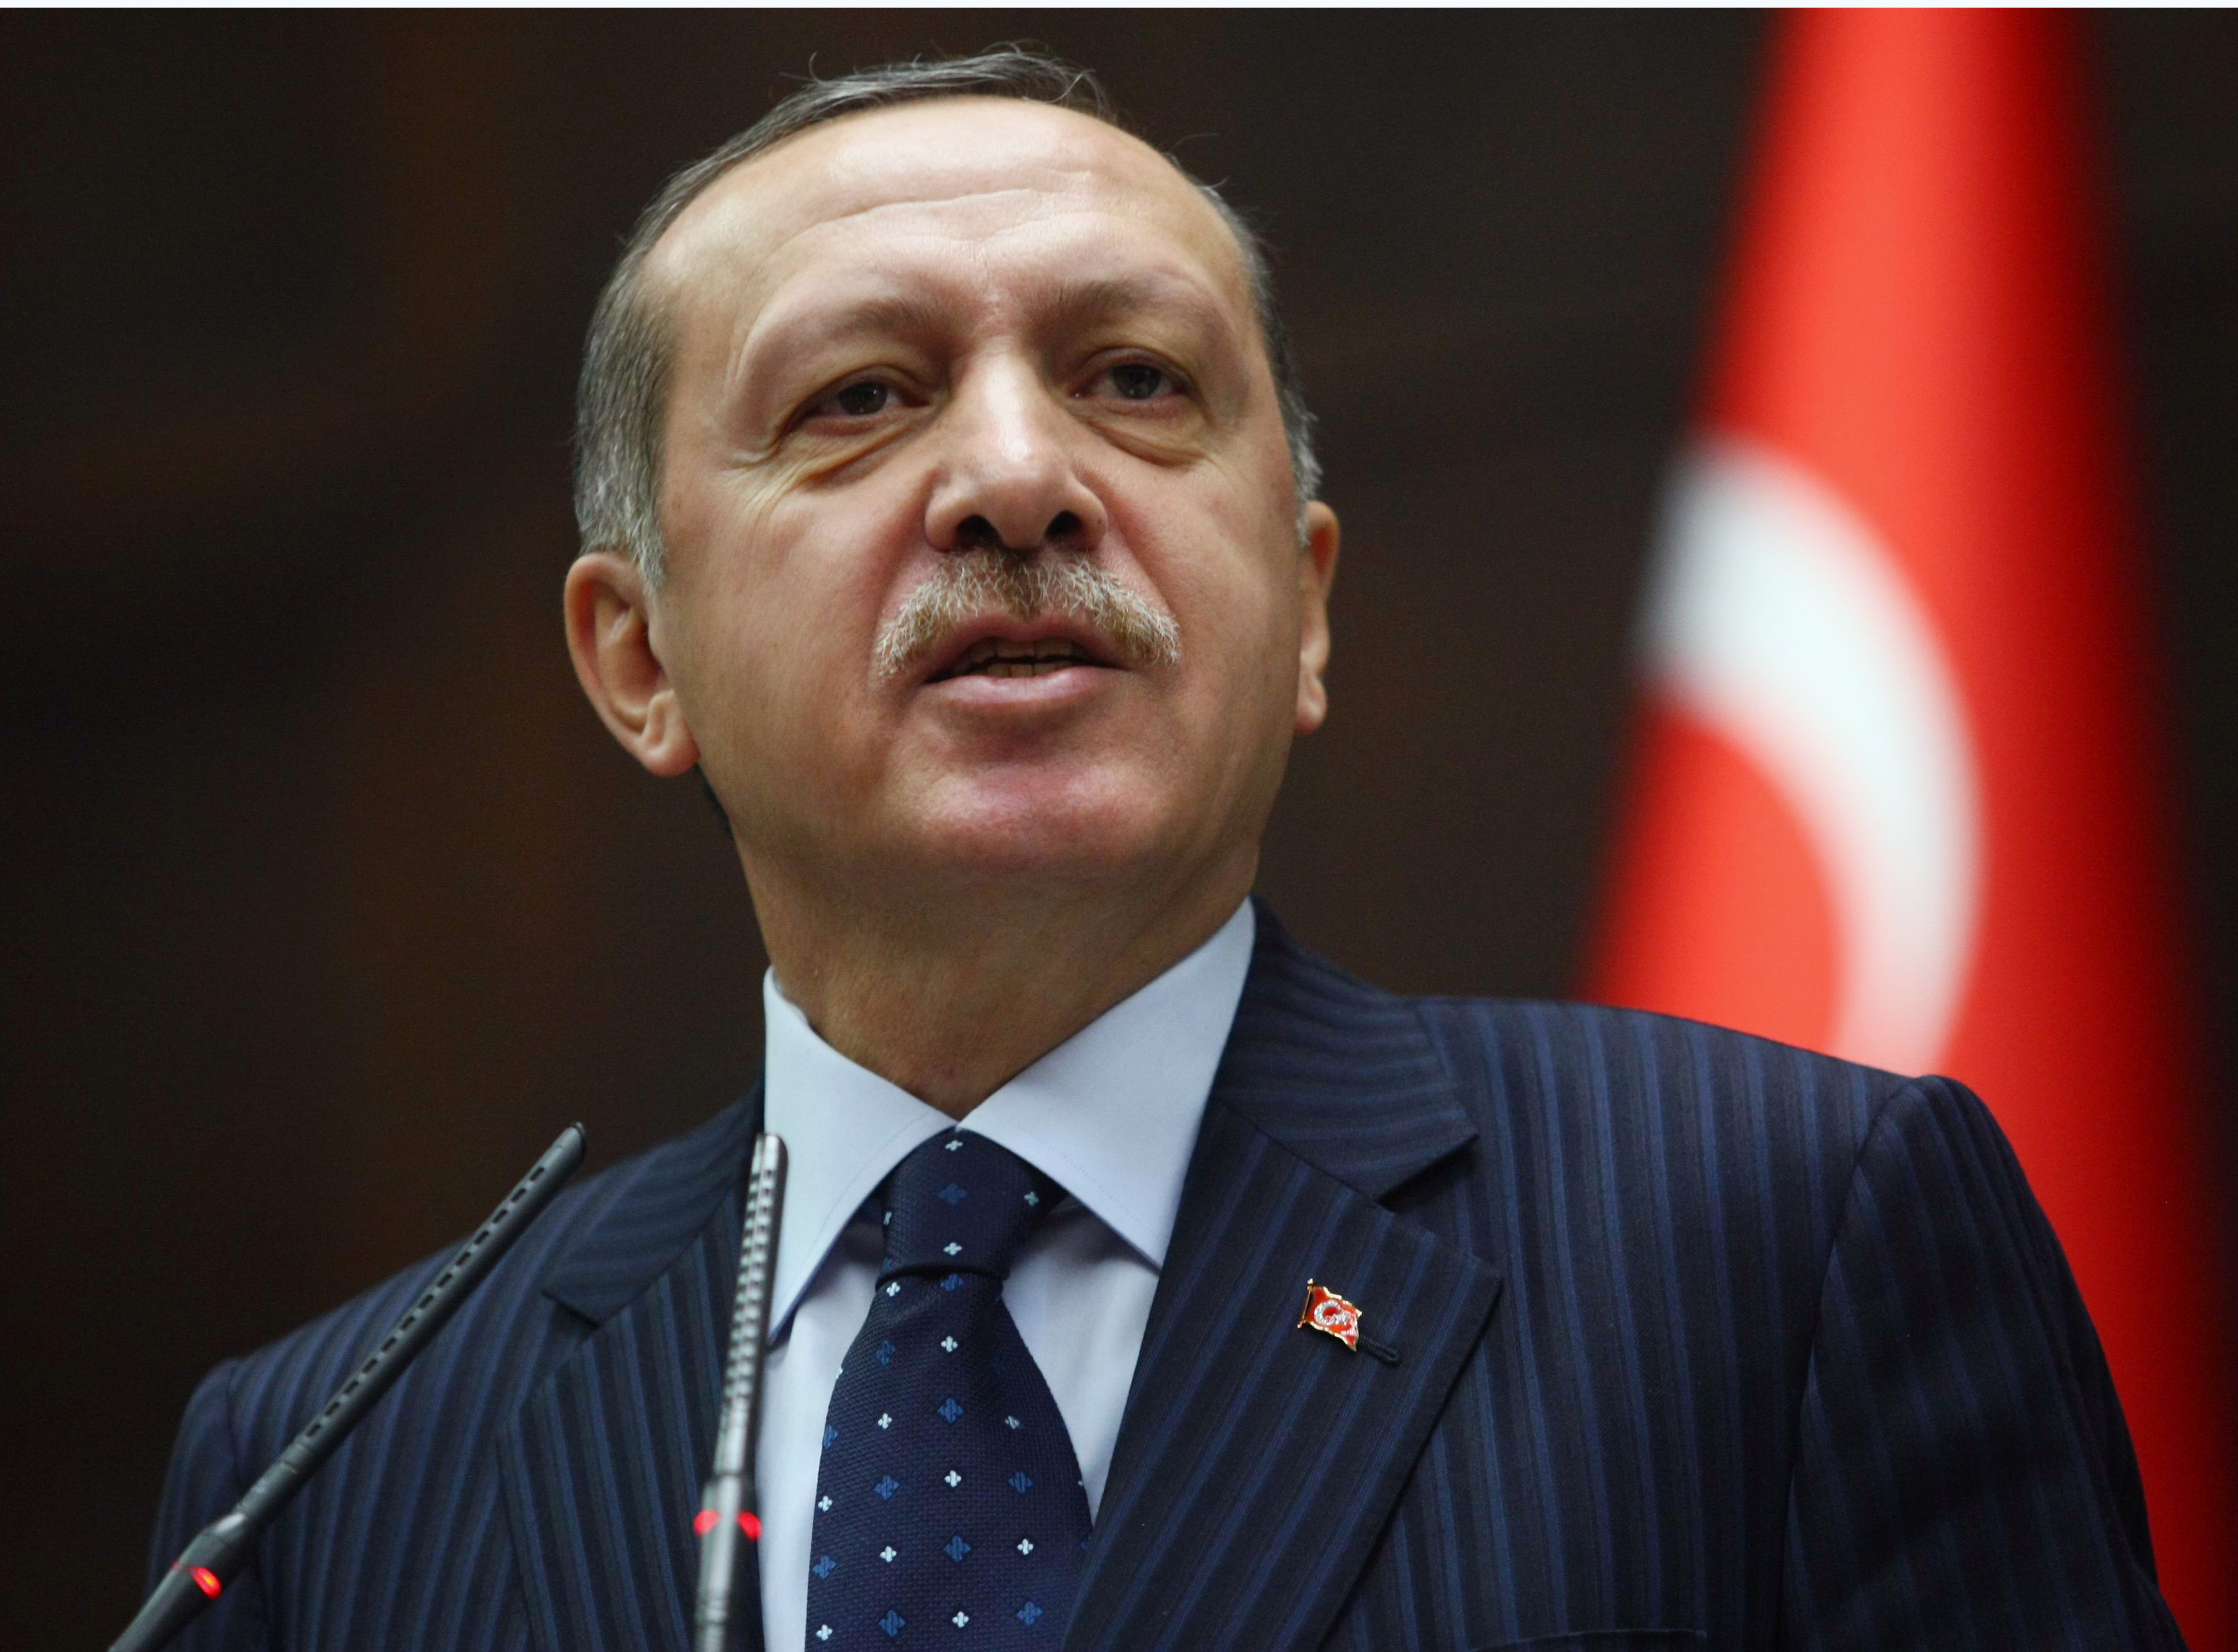 Erdogan rămâne liderul absolut în Turcia